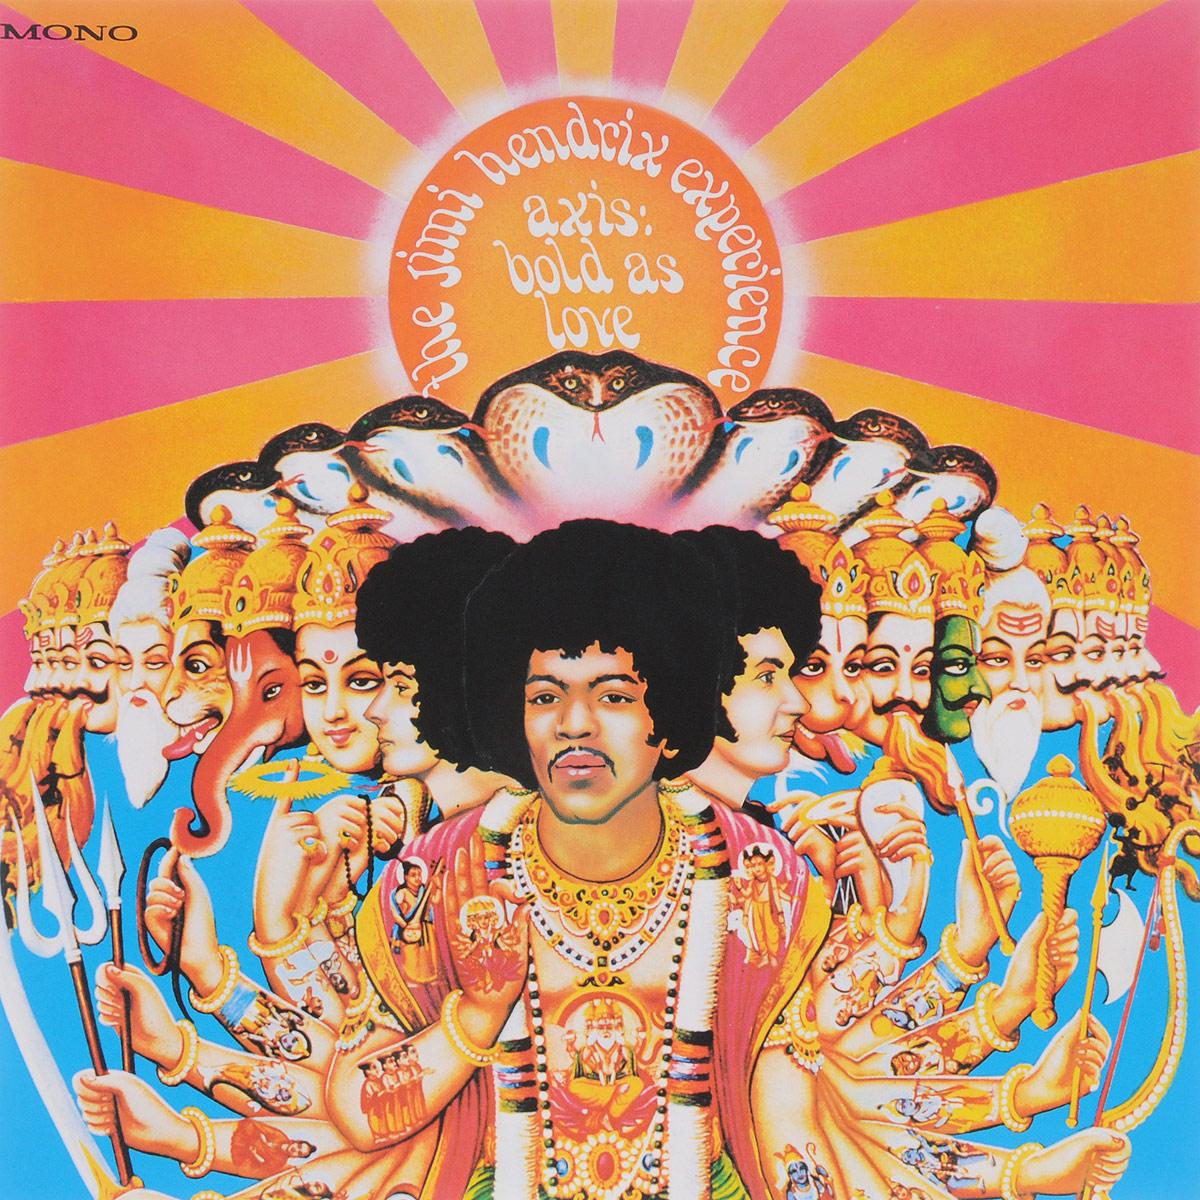 джими хендрикс jimi hendrix experience hendrix the best of jimi hendrix 2 lp Джими Хендрикс The Jimi Hendrix Experience. Axis. Bold As Love (LP)